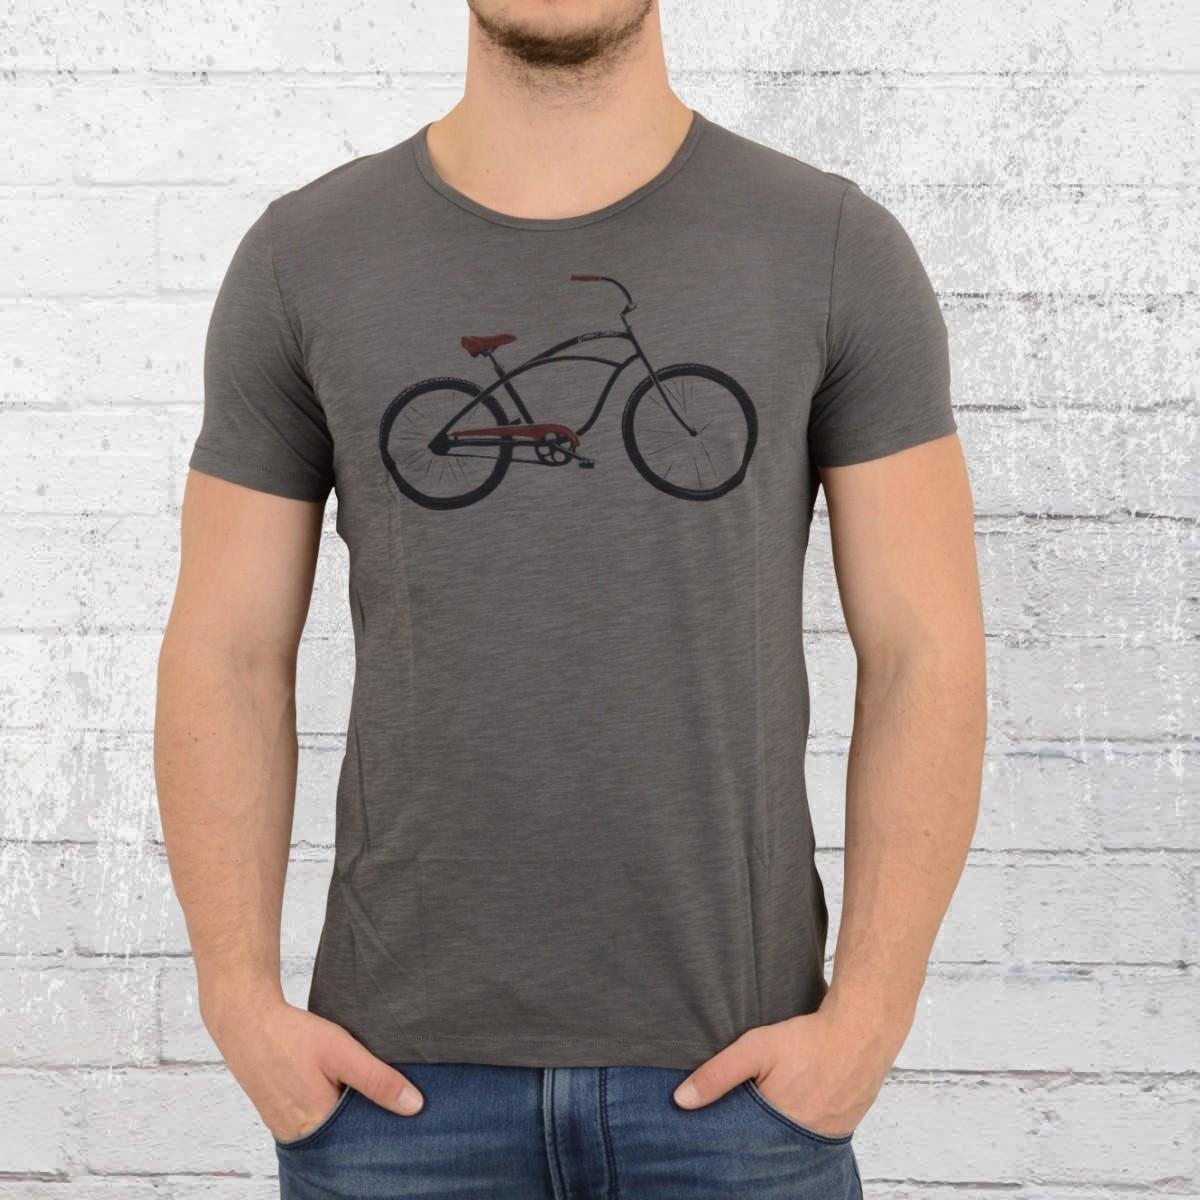 Greenbomb Fahrrad Herren T-Shirt Beach Cruiser dunkel grau